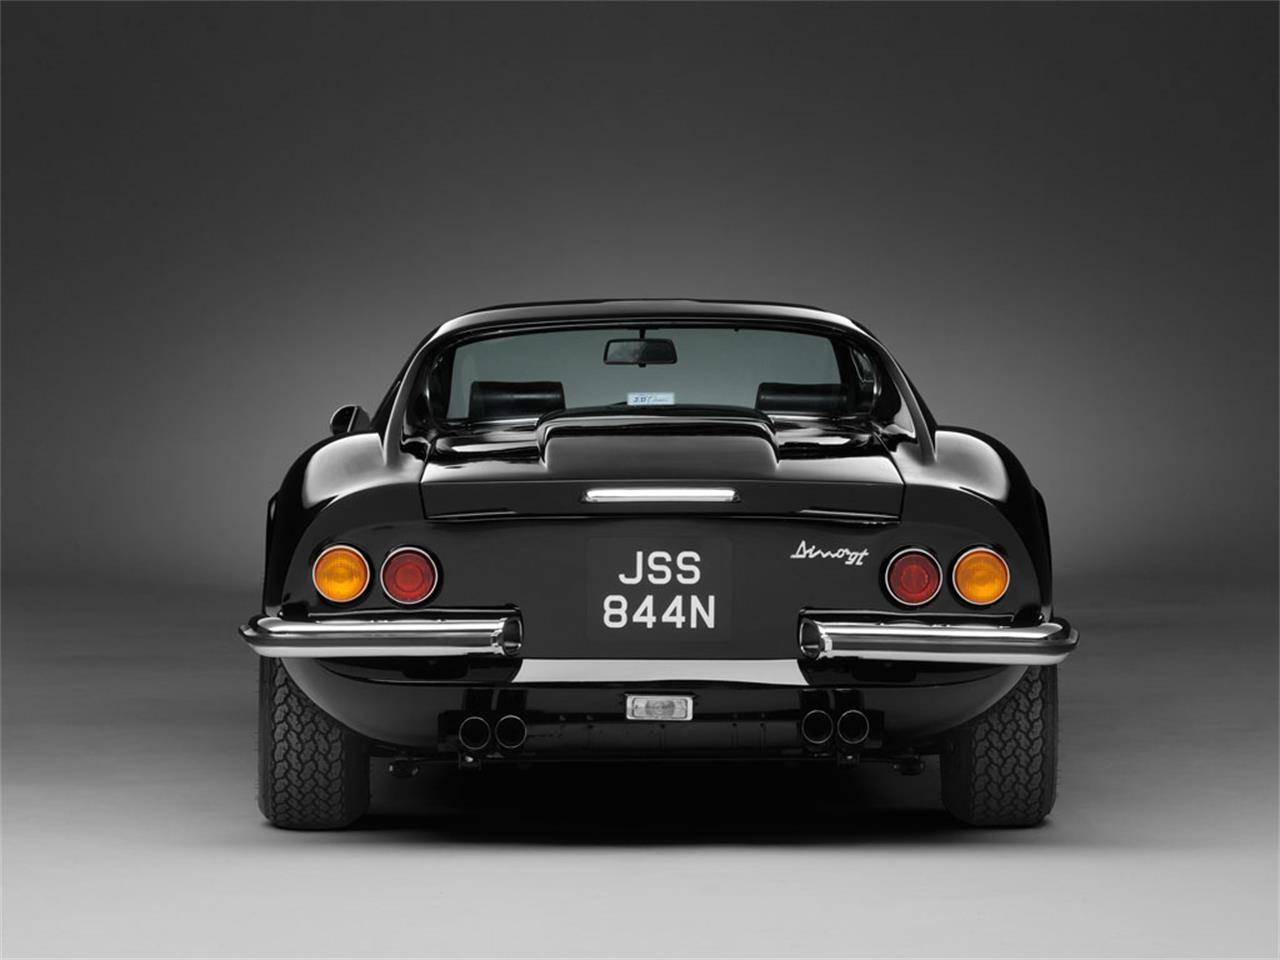 1973 Ferrari Dino 246 GTS LHD E Series for Sale | ClassicCars.com | CC-880448